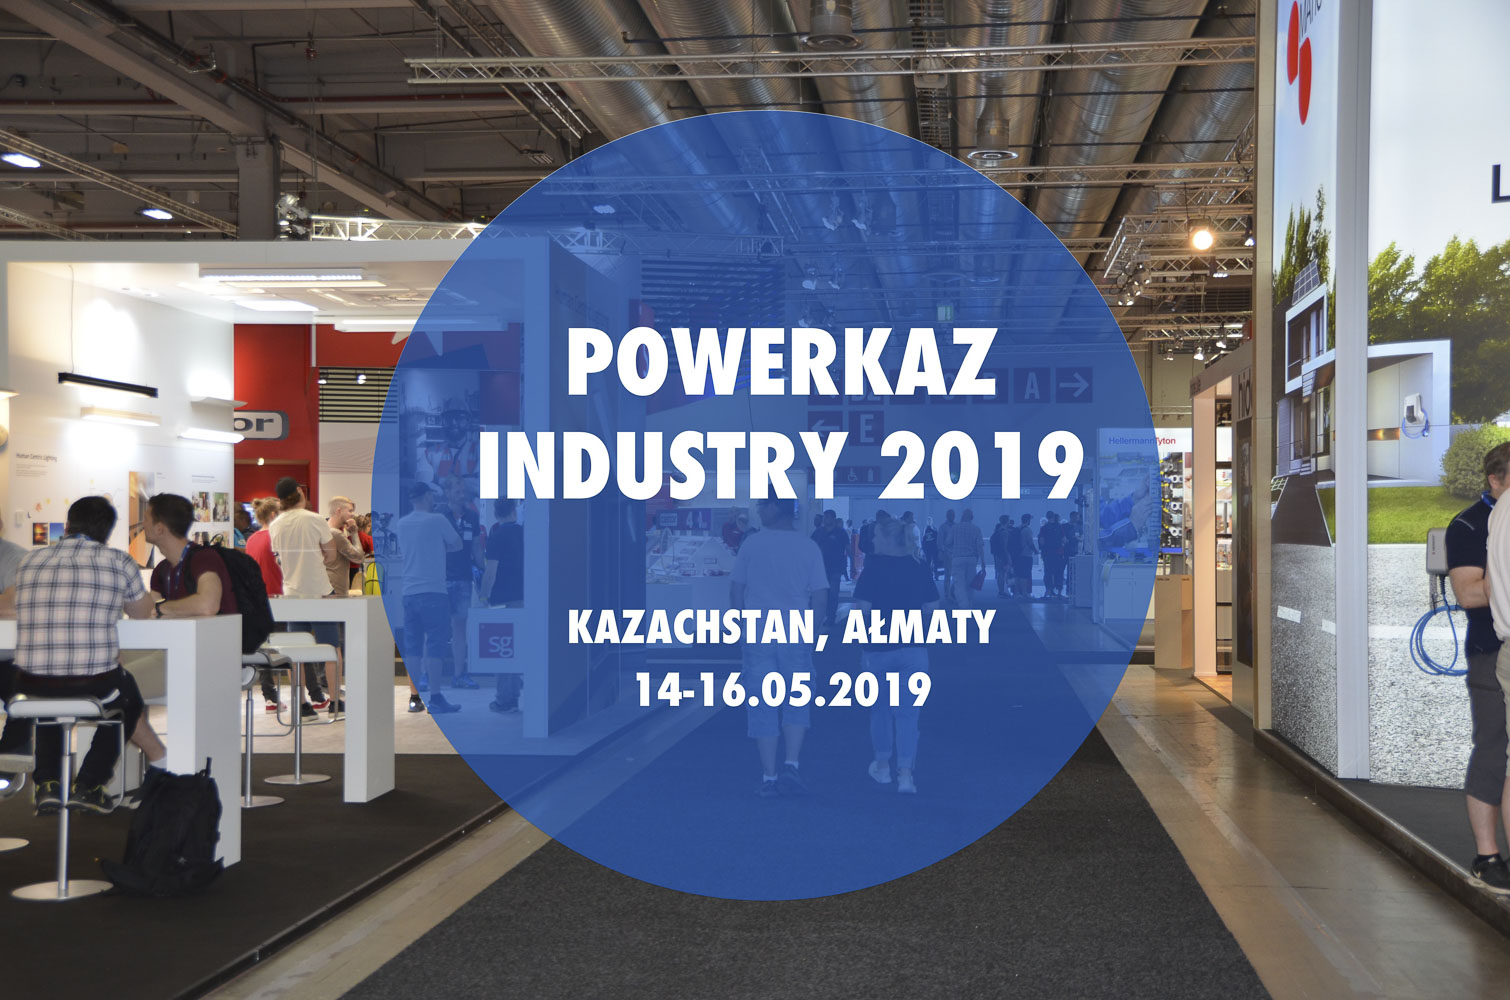 Zapraszamy na nasze stoisko POWER-KAZINDUSTRY 2019